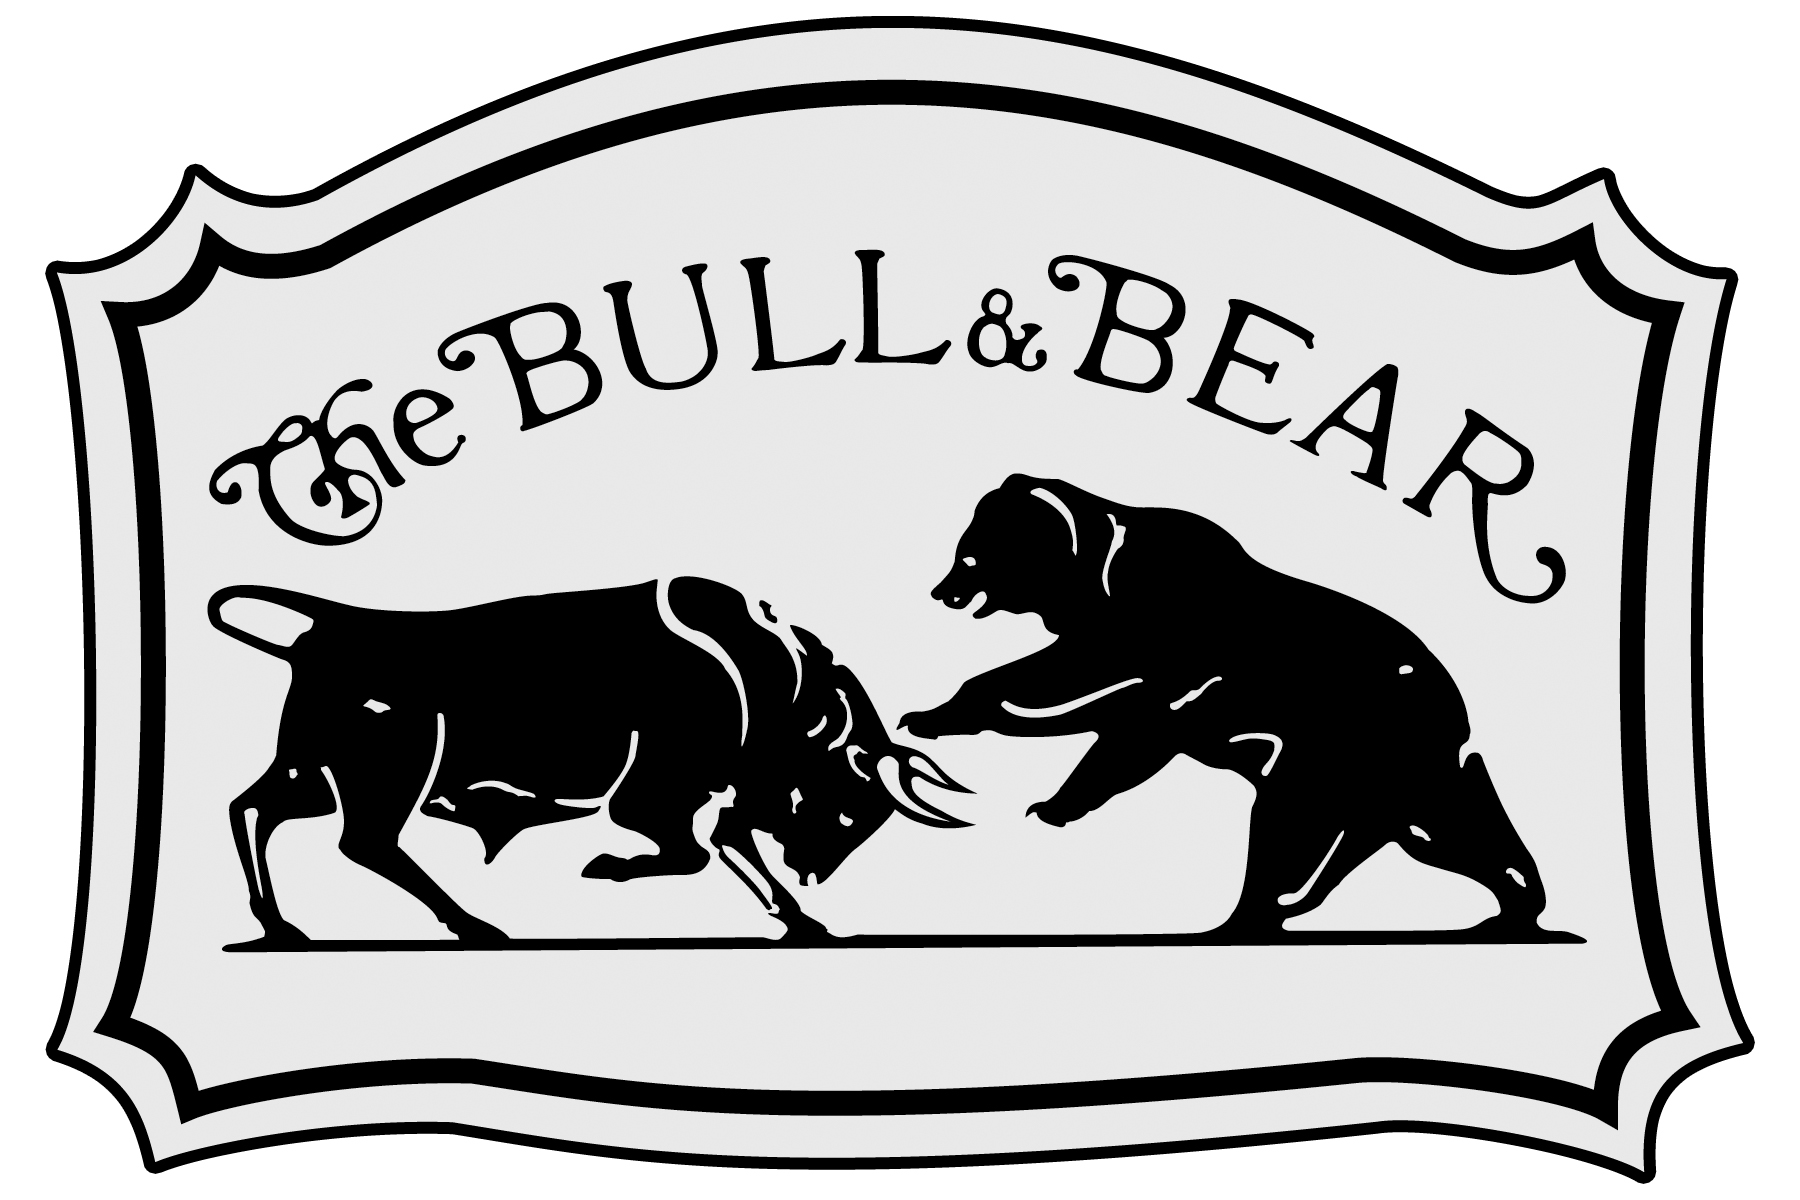 bear logo lounge - Google Search | bear | Pinterest | Bear logo and ...